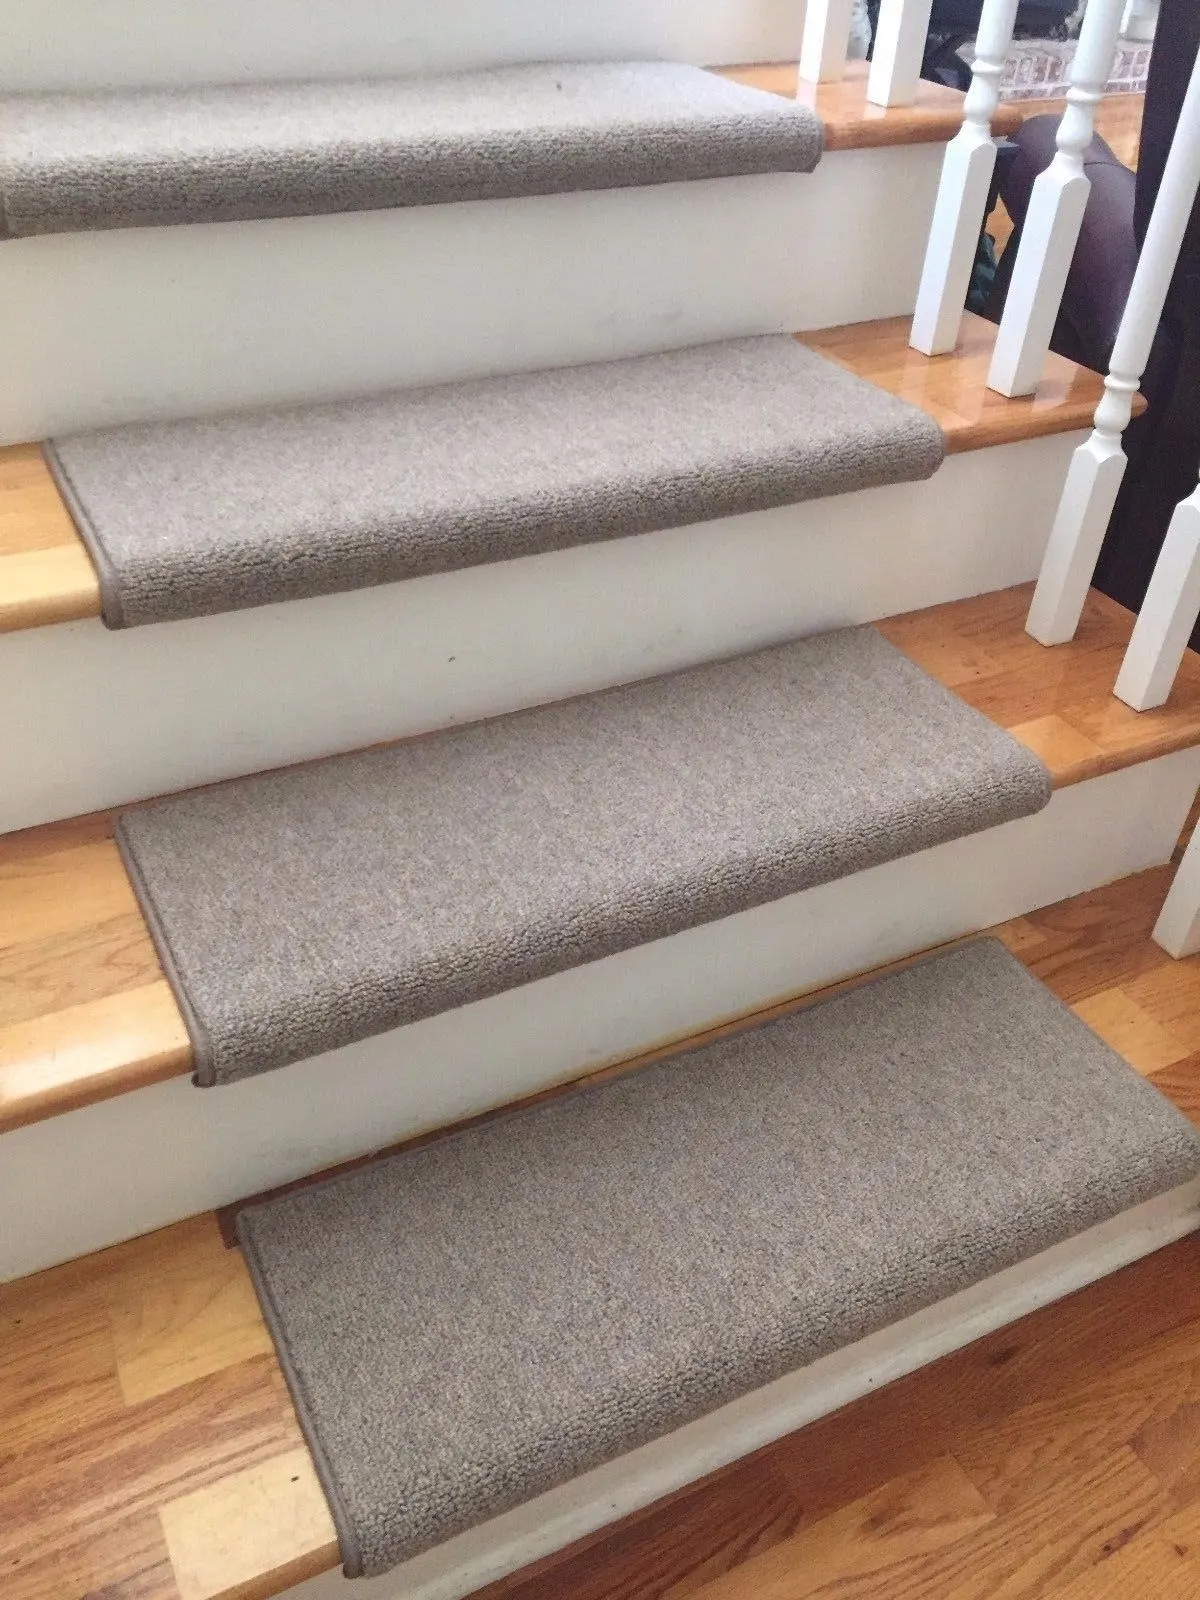 Richmond Taupe New Zealand Wool True Bullnose™ Padded Carpet | Individual Carpet Stair Treads | Bullnose Carpet | Wood | Hardwood | Flooring | Spiral Staircase